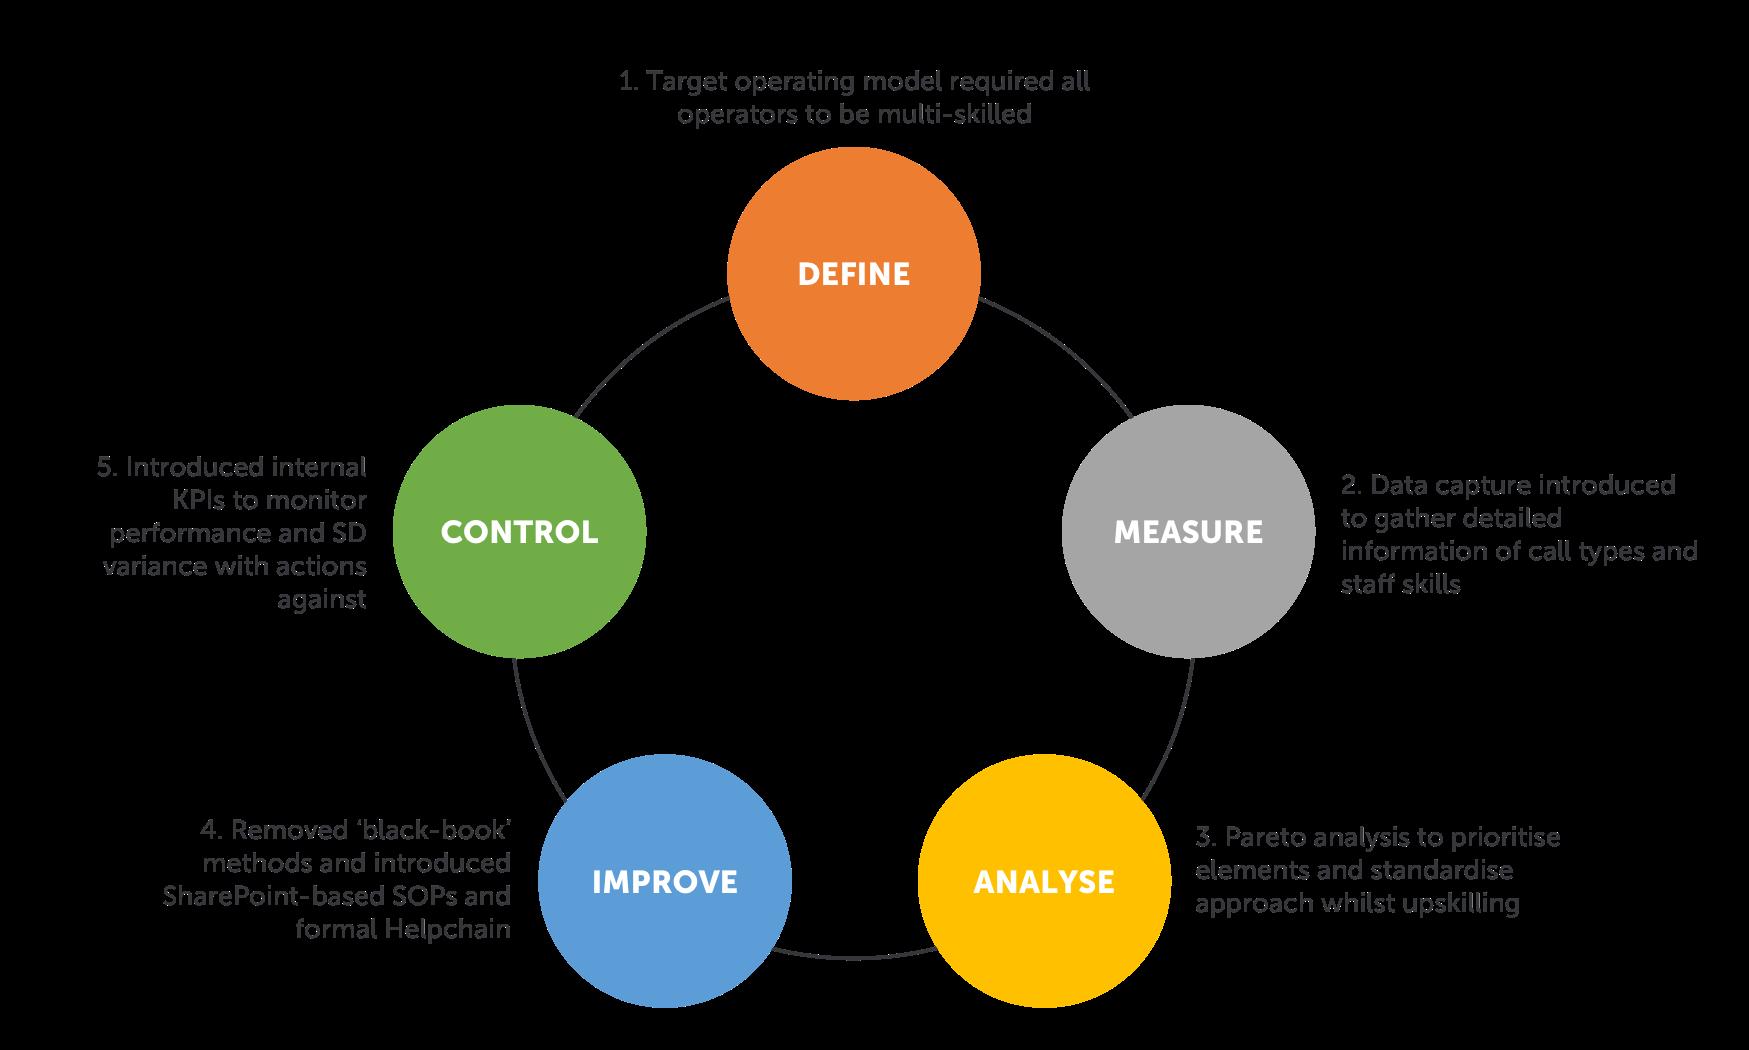 DMAIC Process Model